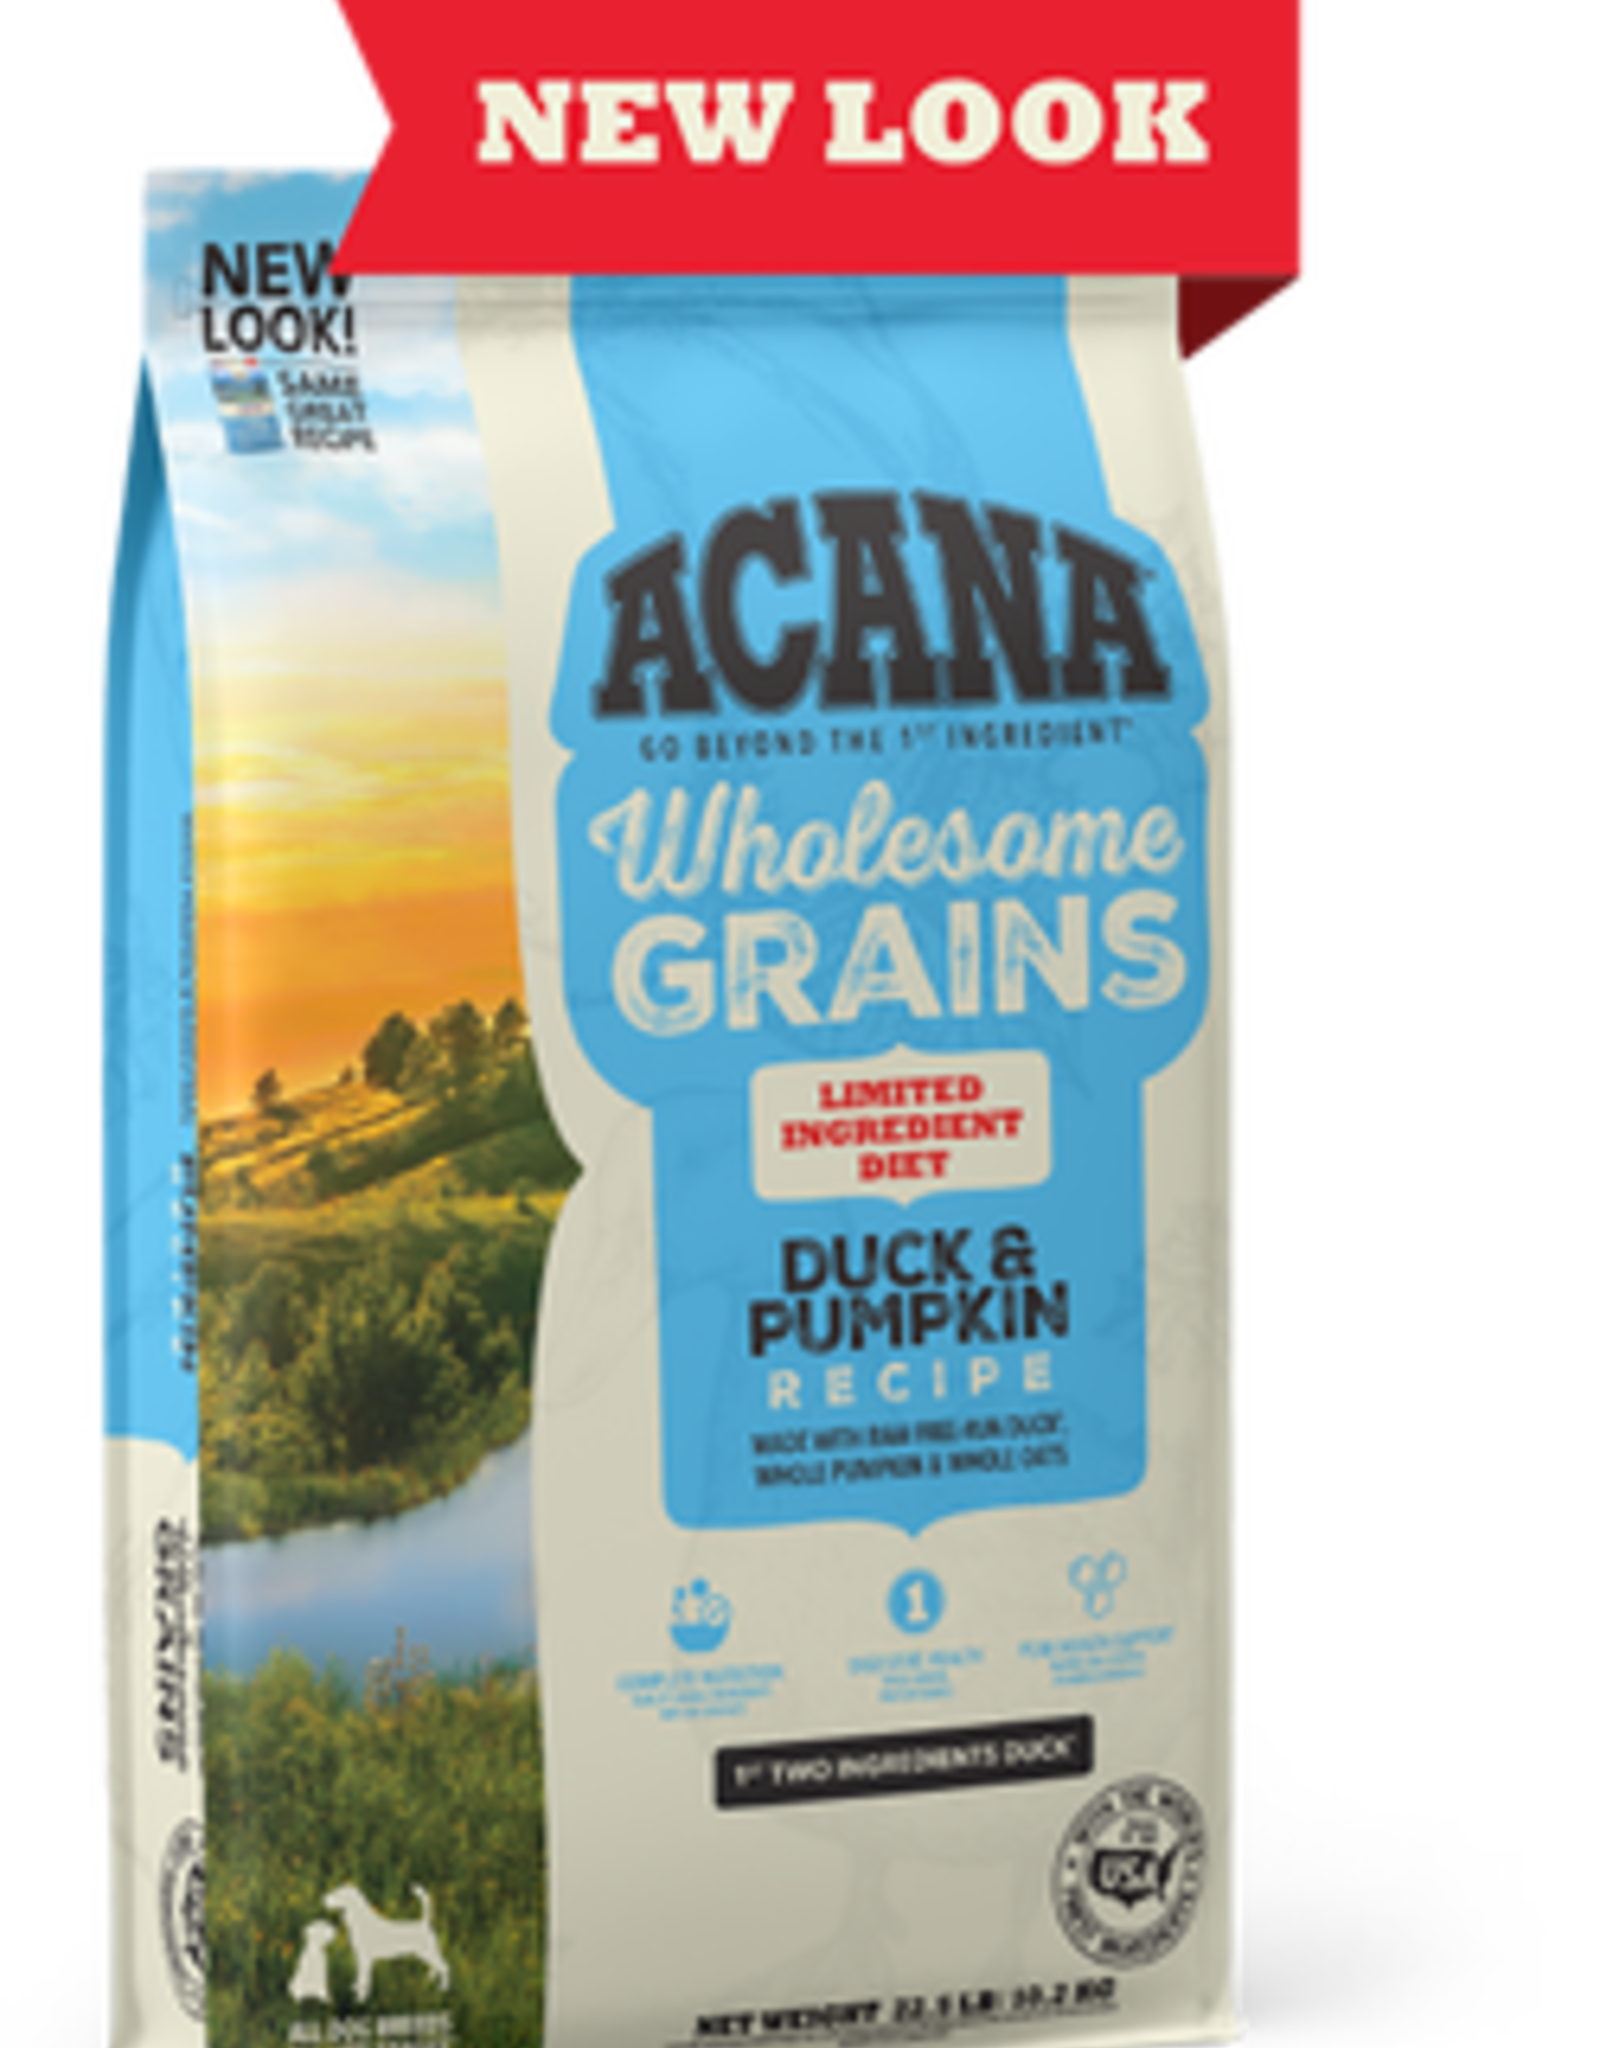 CHAMPION PET FOOD ACANA SINGLES DUCK & PUMPKIN WHOLESOME GRAINS 22.5LBS